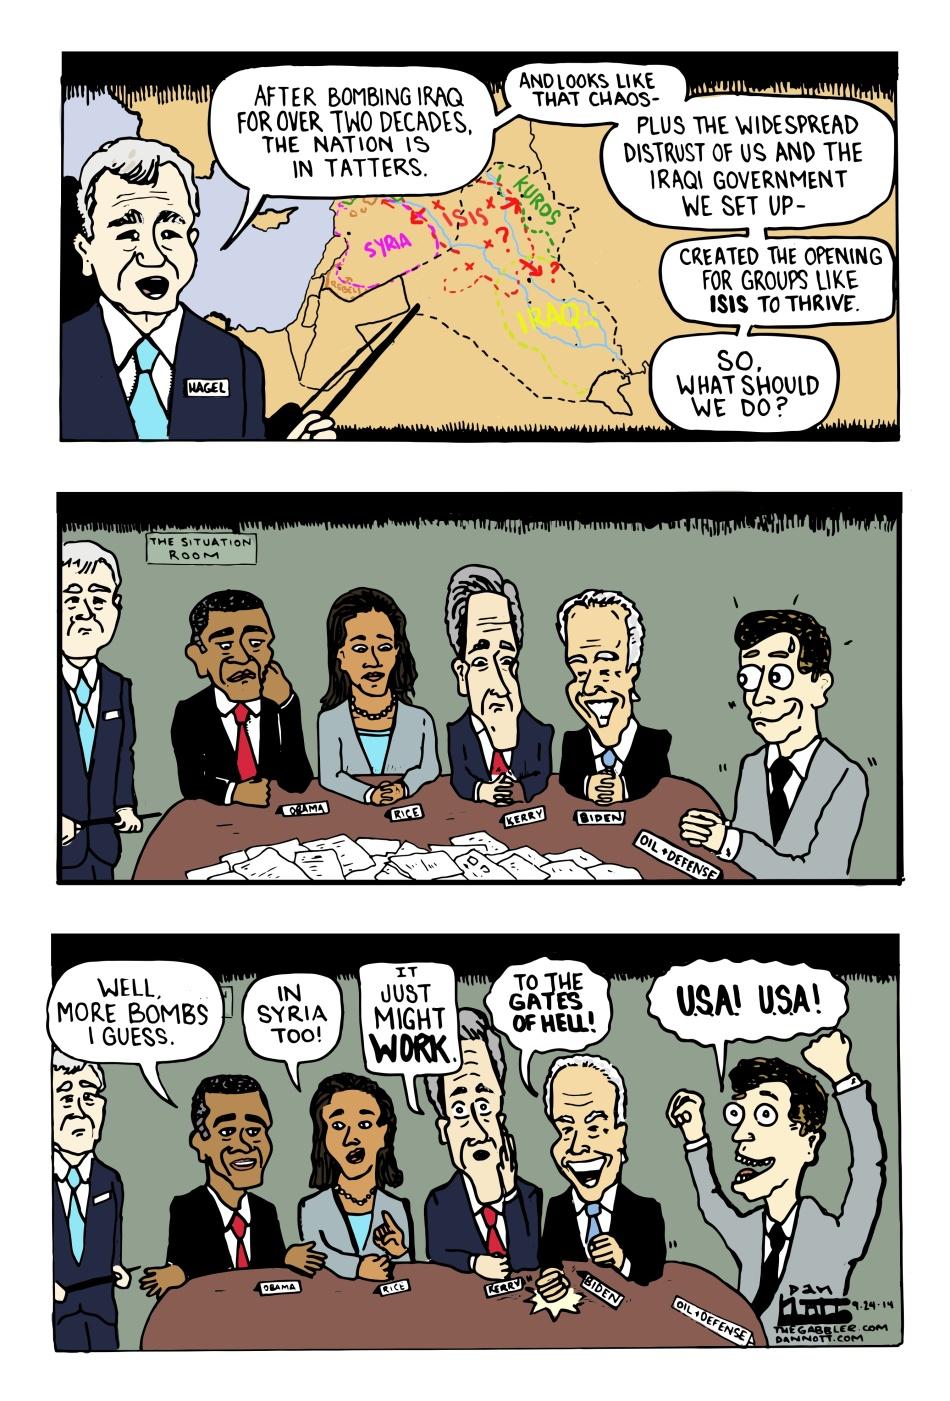 Obama's Plan to Fix Iraq